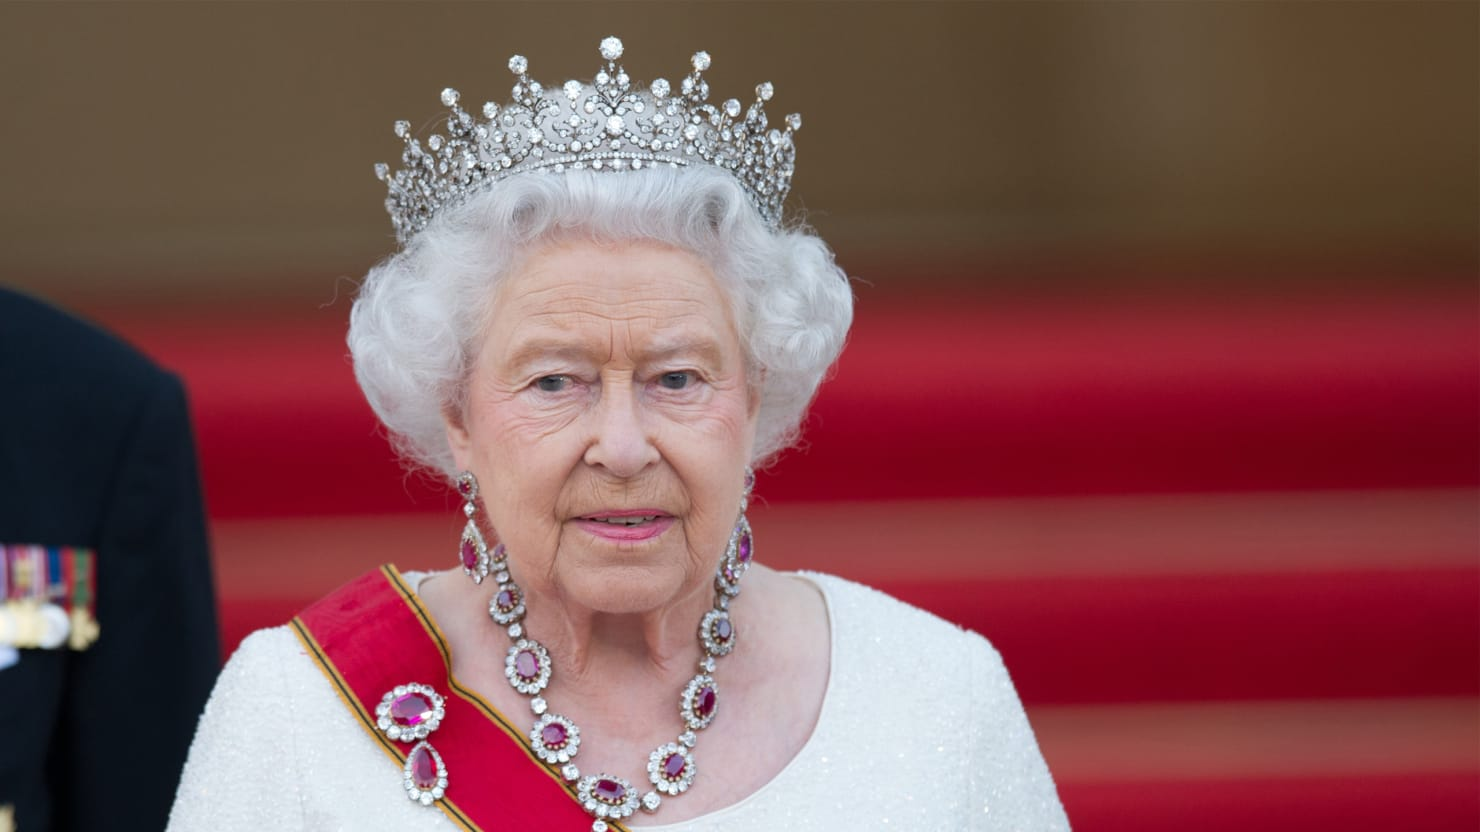 Half Jacket 2 0 >> Buckingham Palace Slams Video Of Queen Giving Nazi Salute